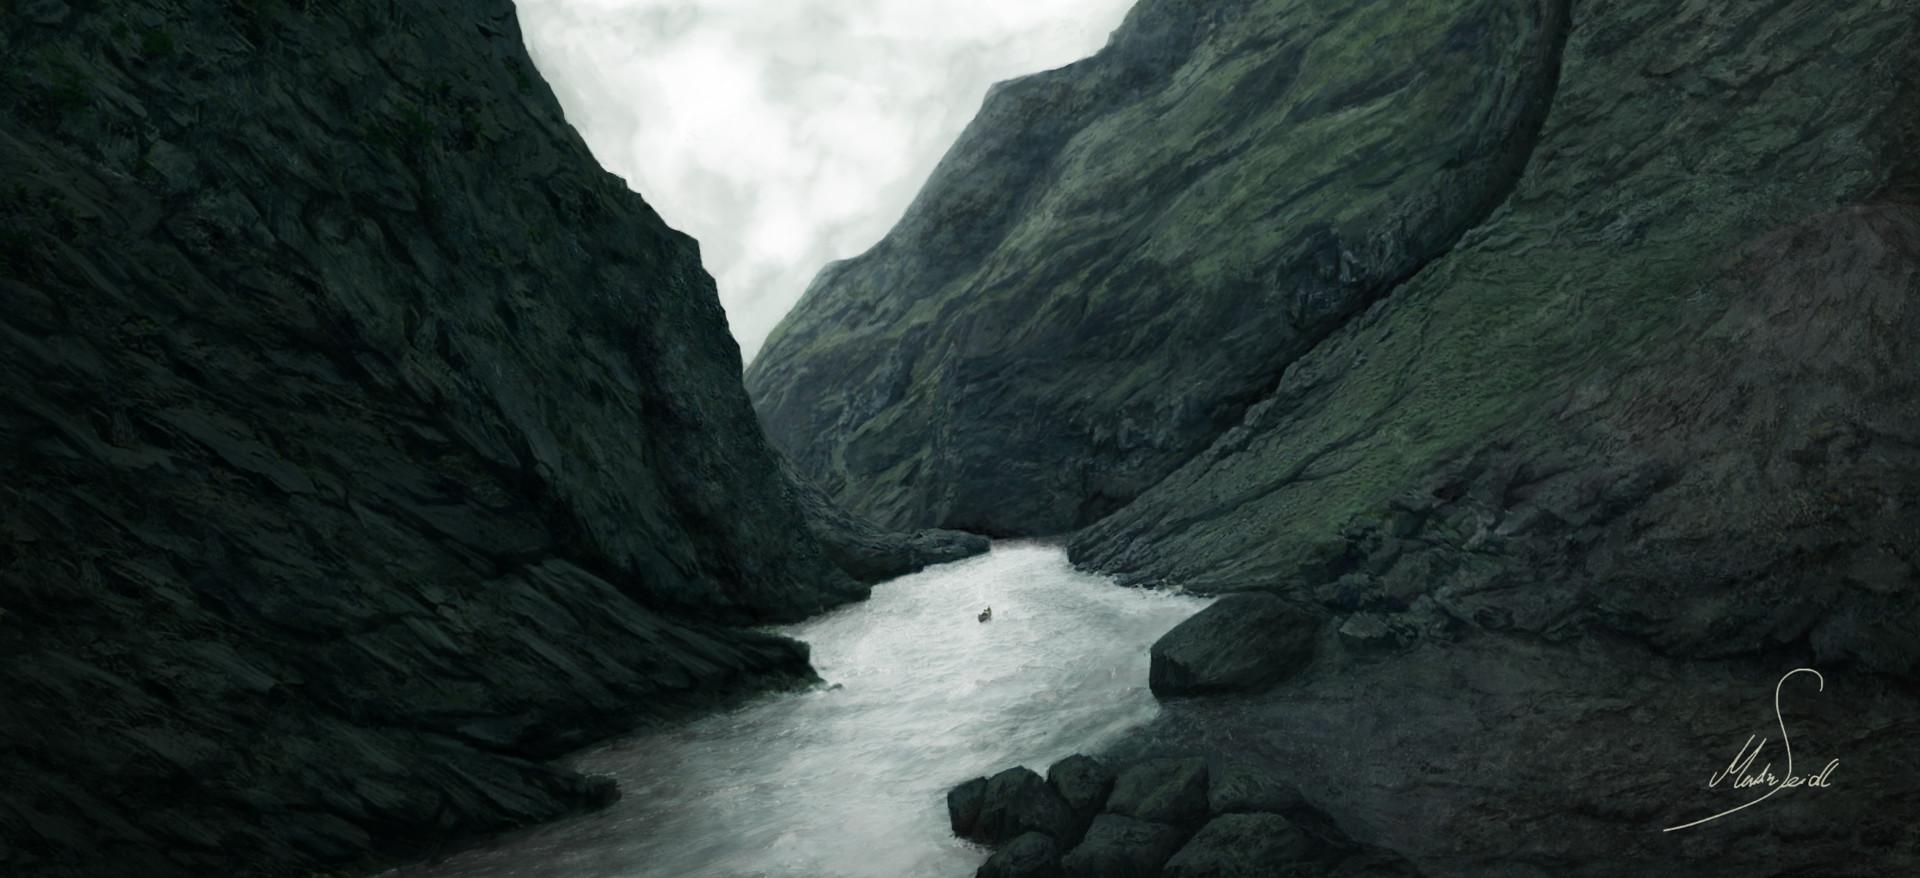 Martin seidl enviroment canyon